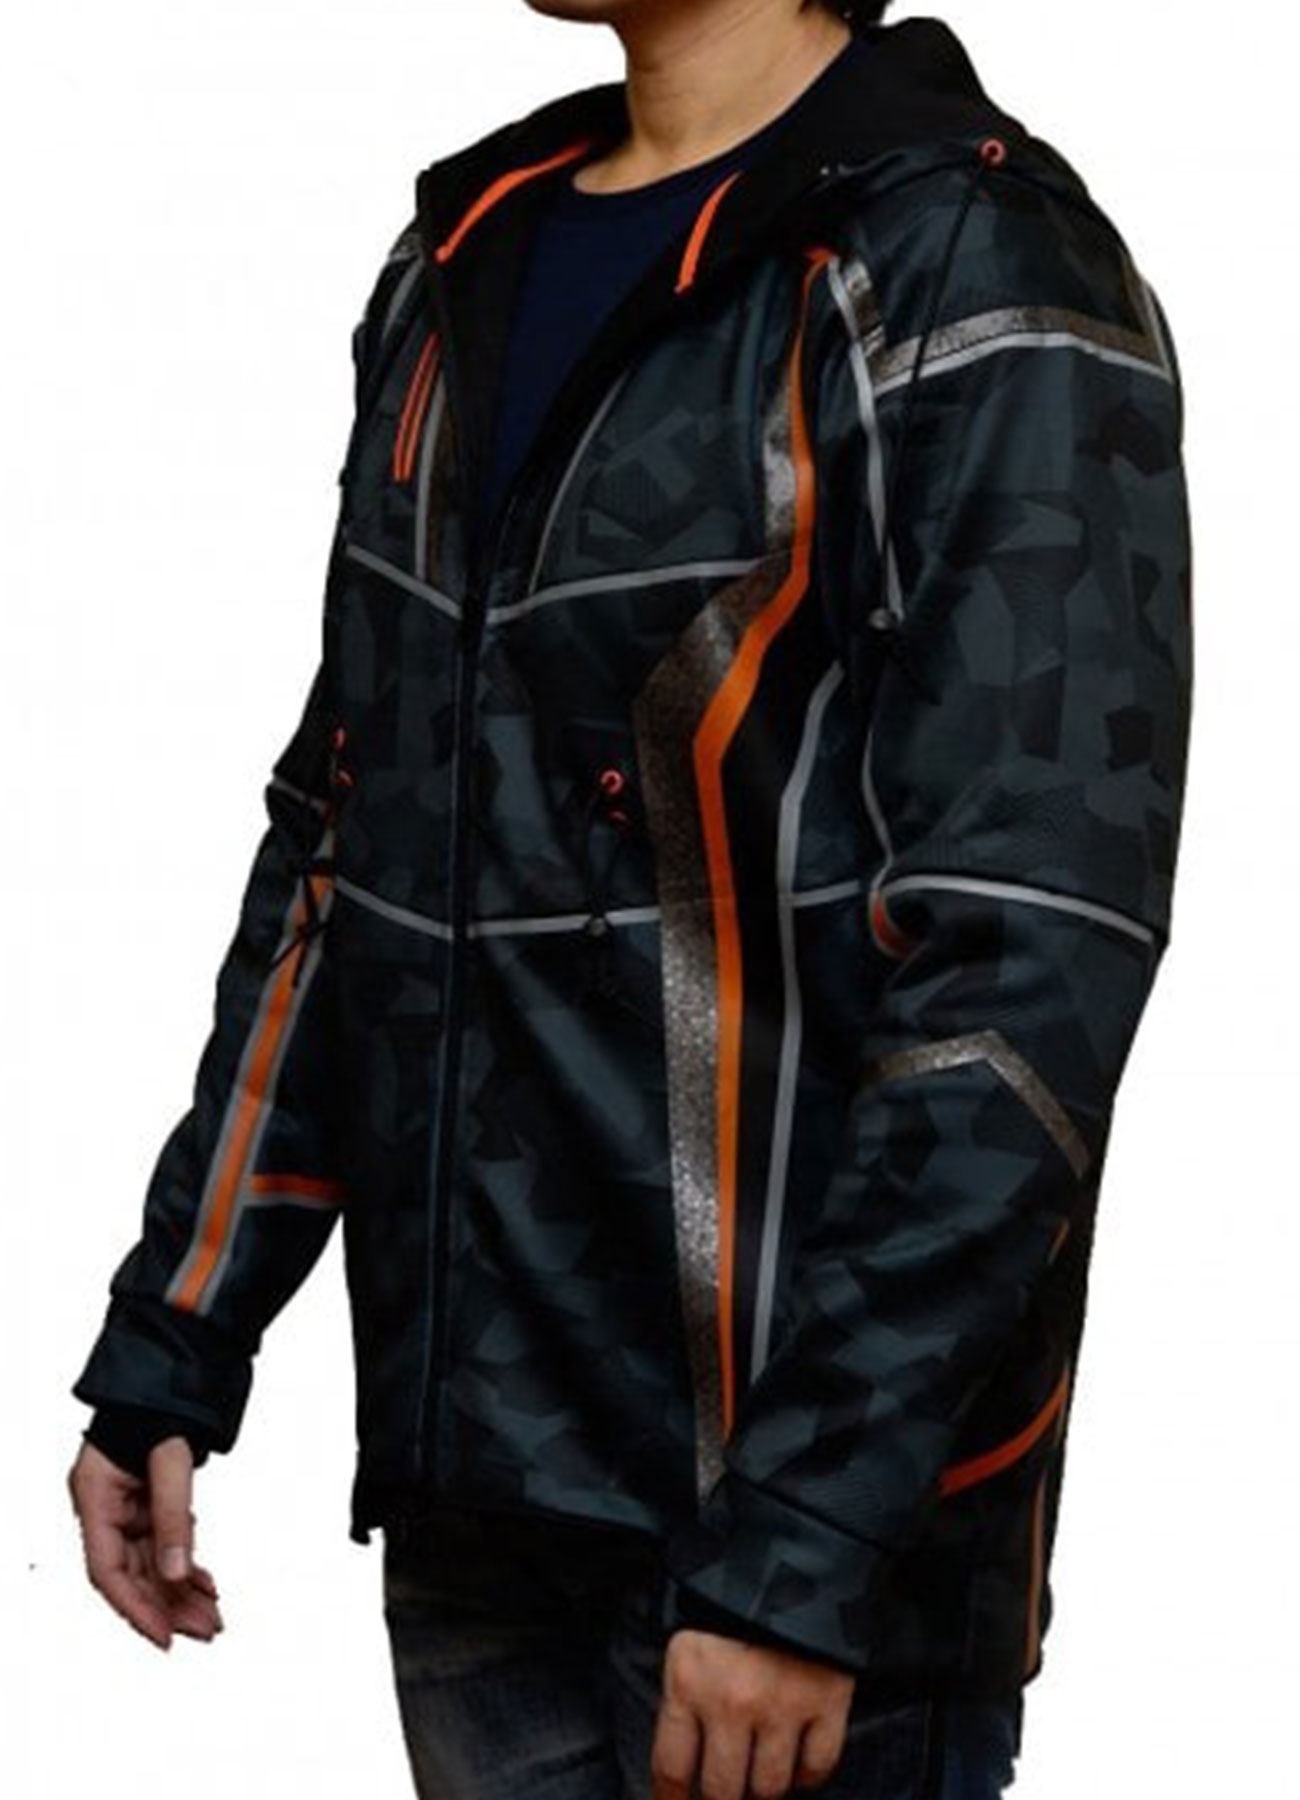 Avengers Infinity War Robert Downey Jr. Satin Fabric Jacket